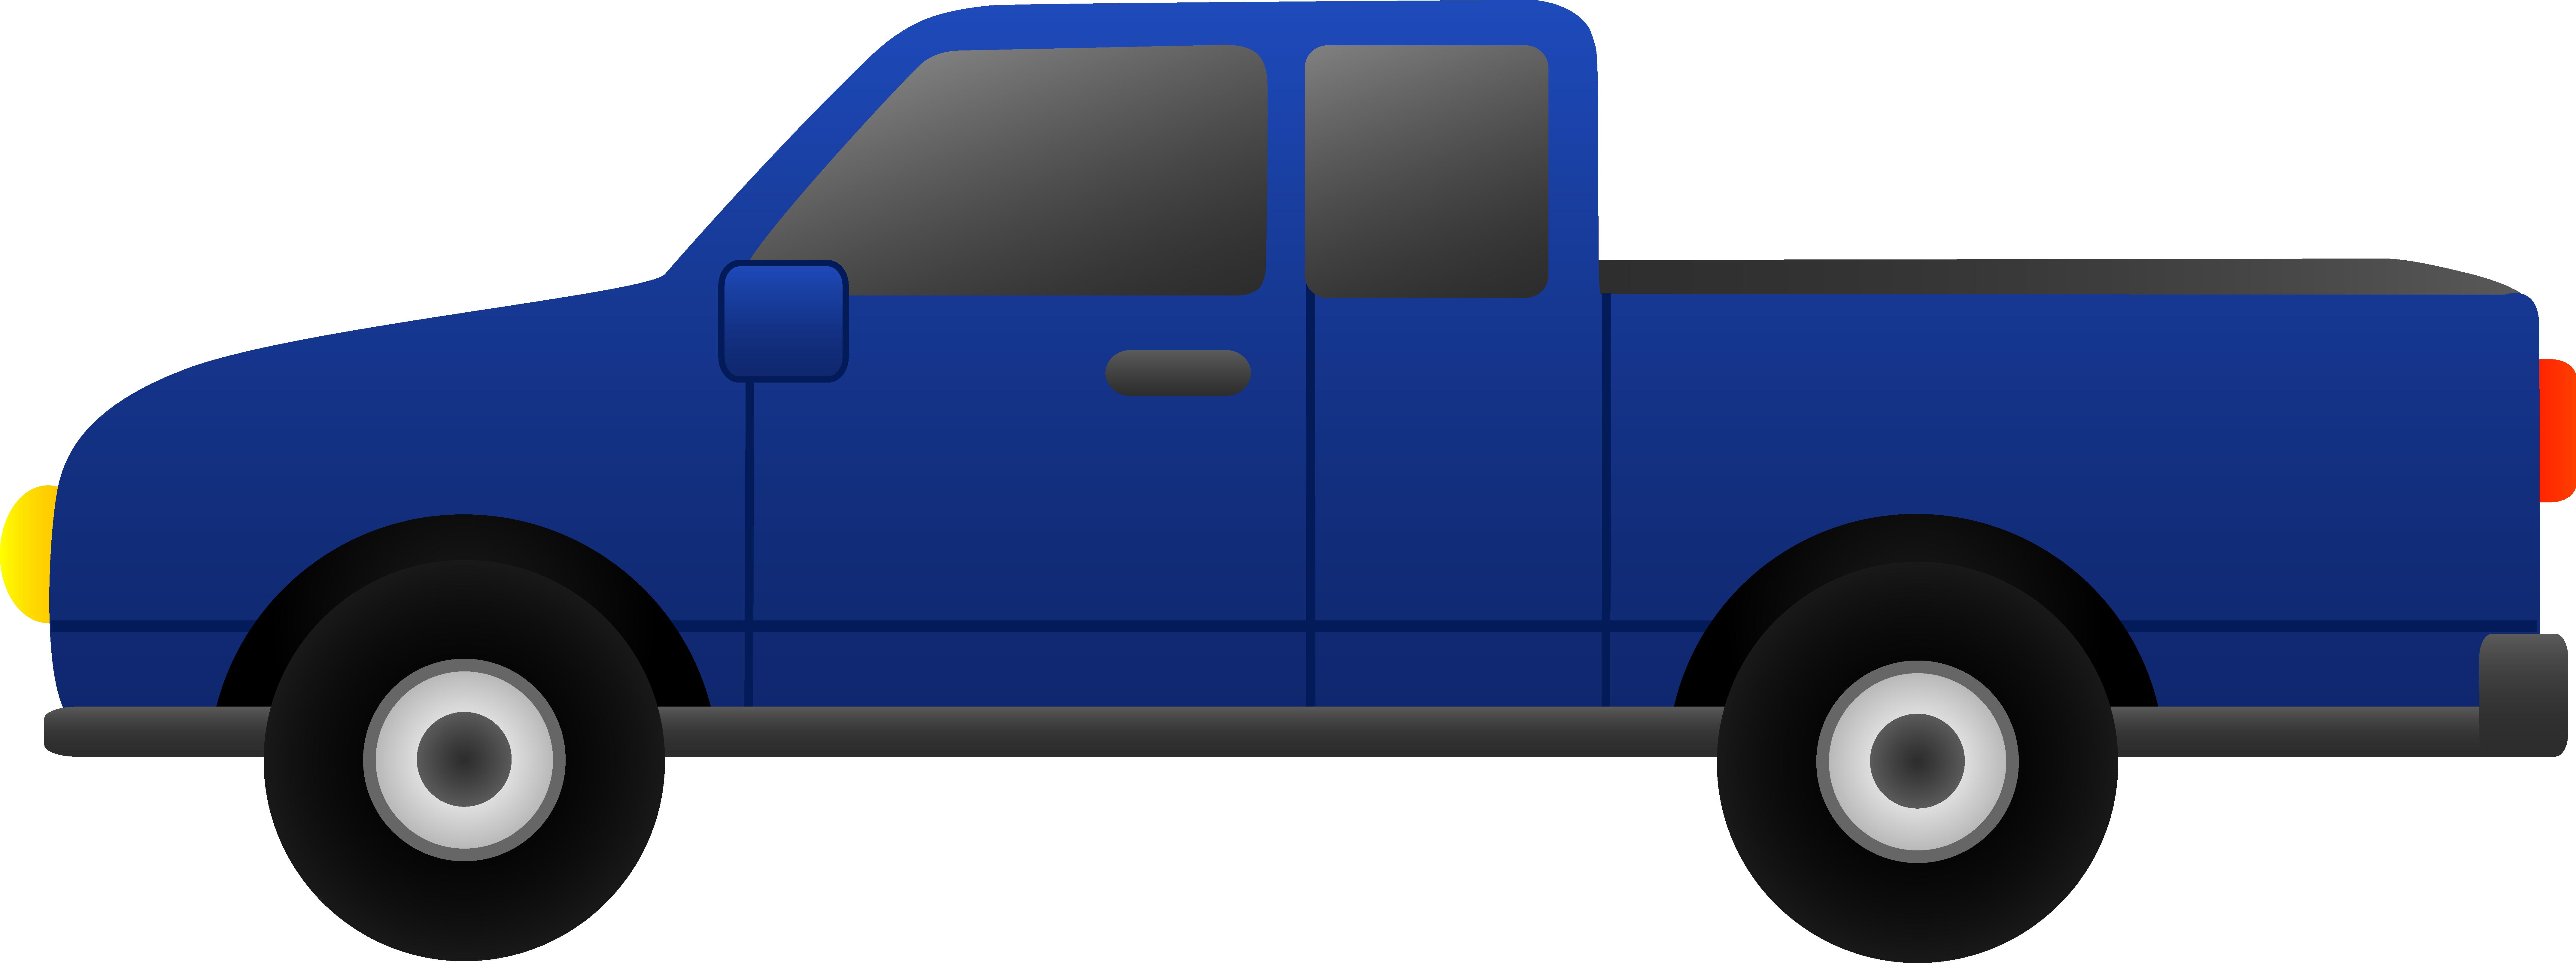 Blue Pickup Truck Clip Art Clip Art Art Cars Pickup Trucks